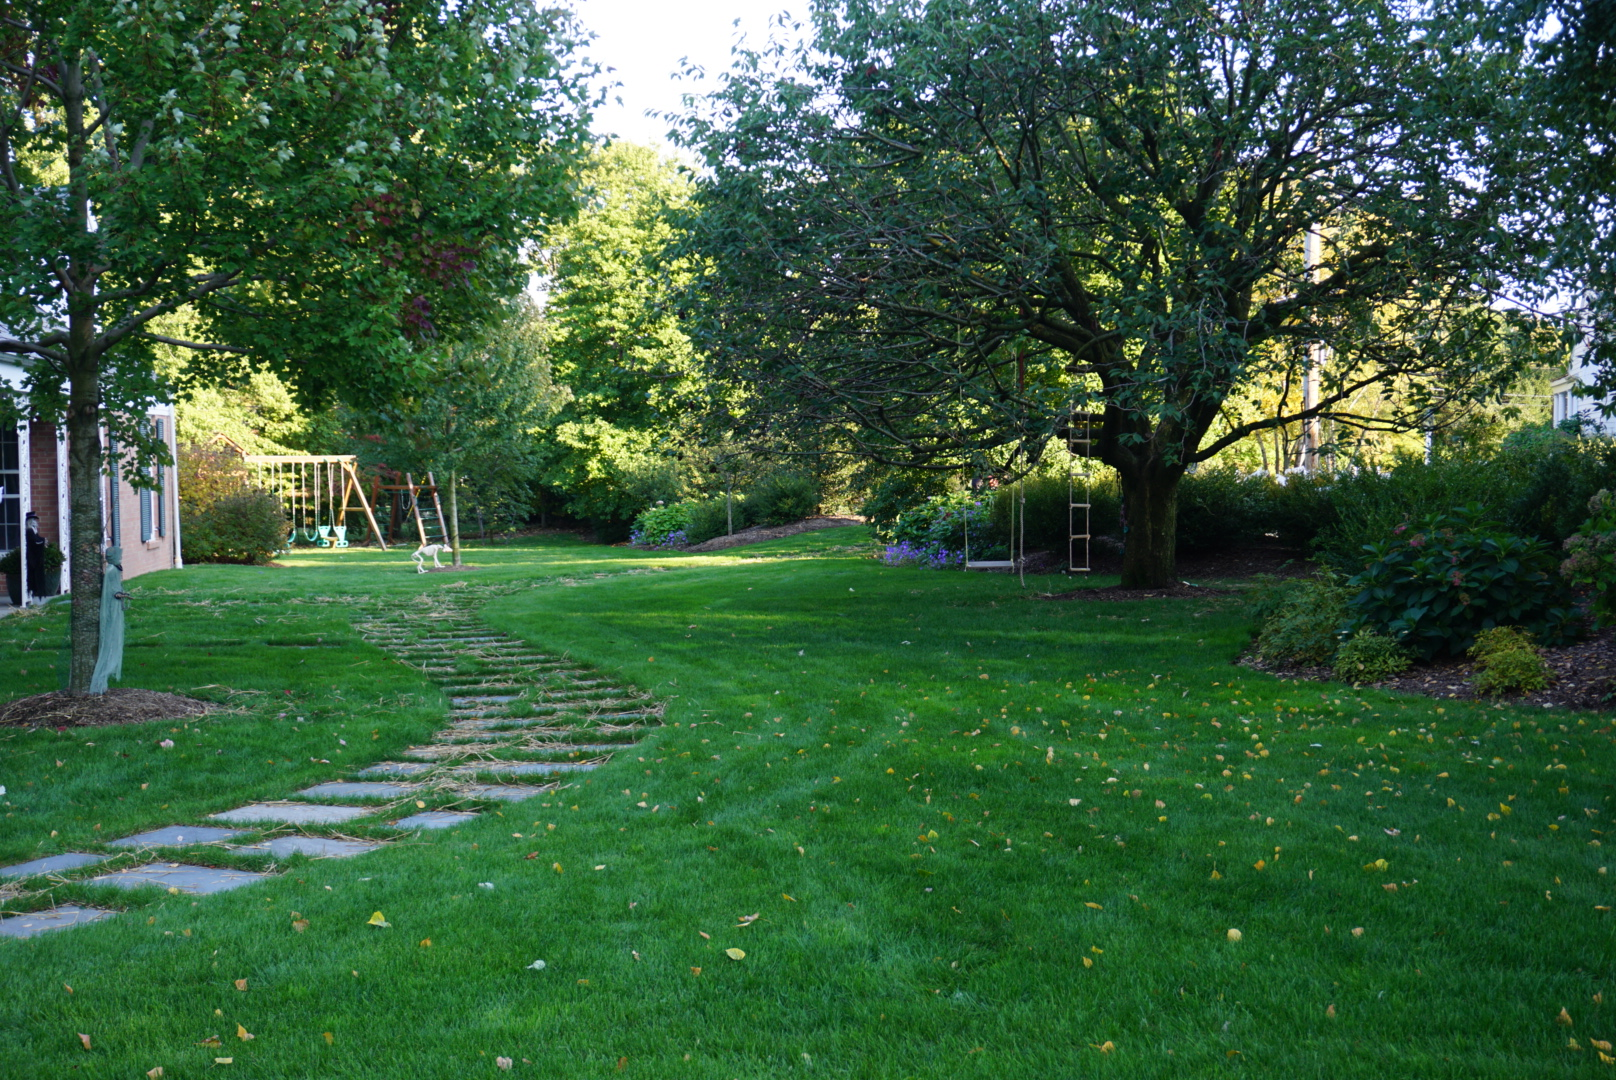 The Albarracins' Yard